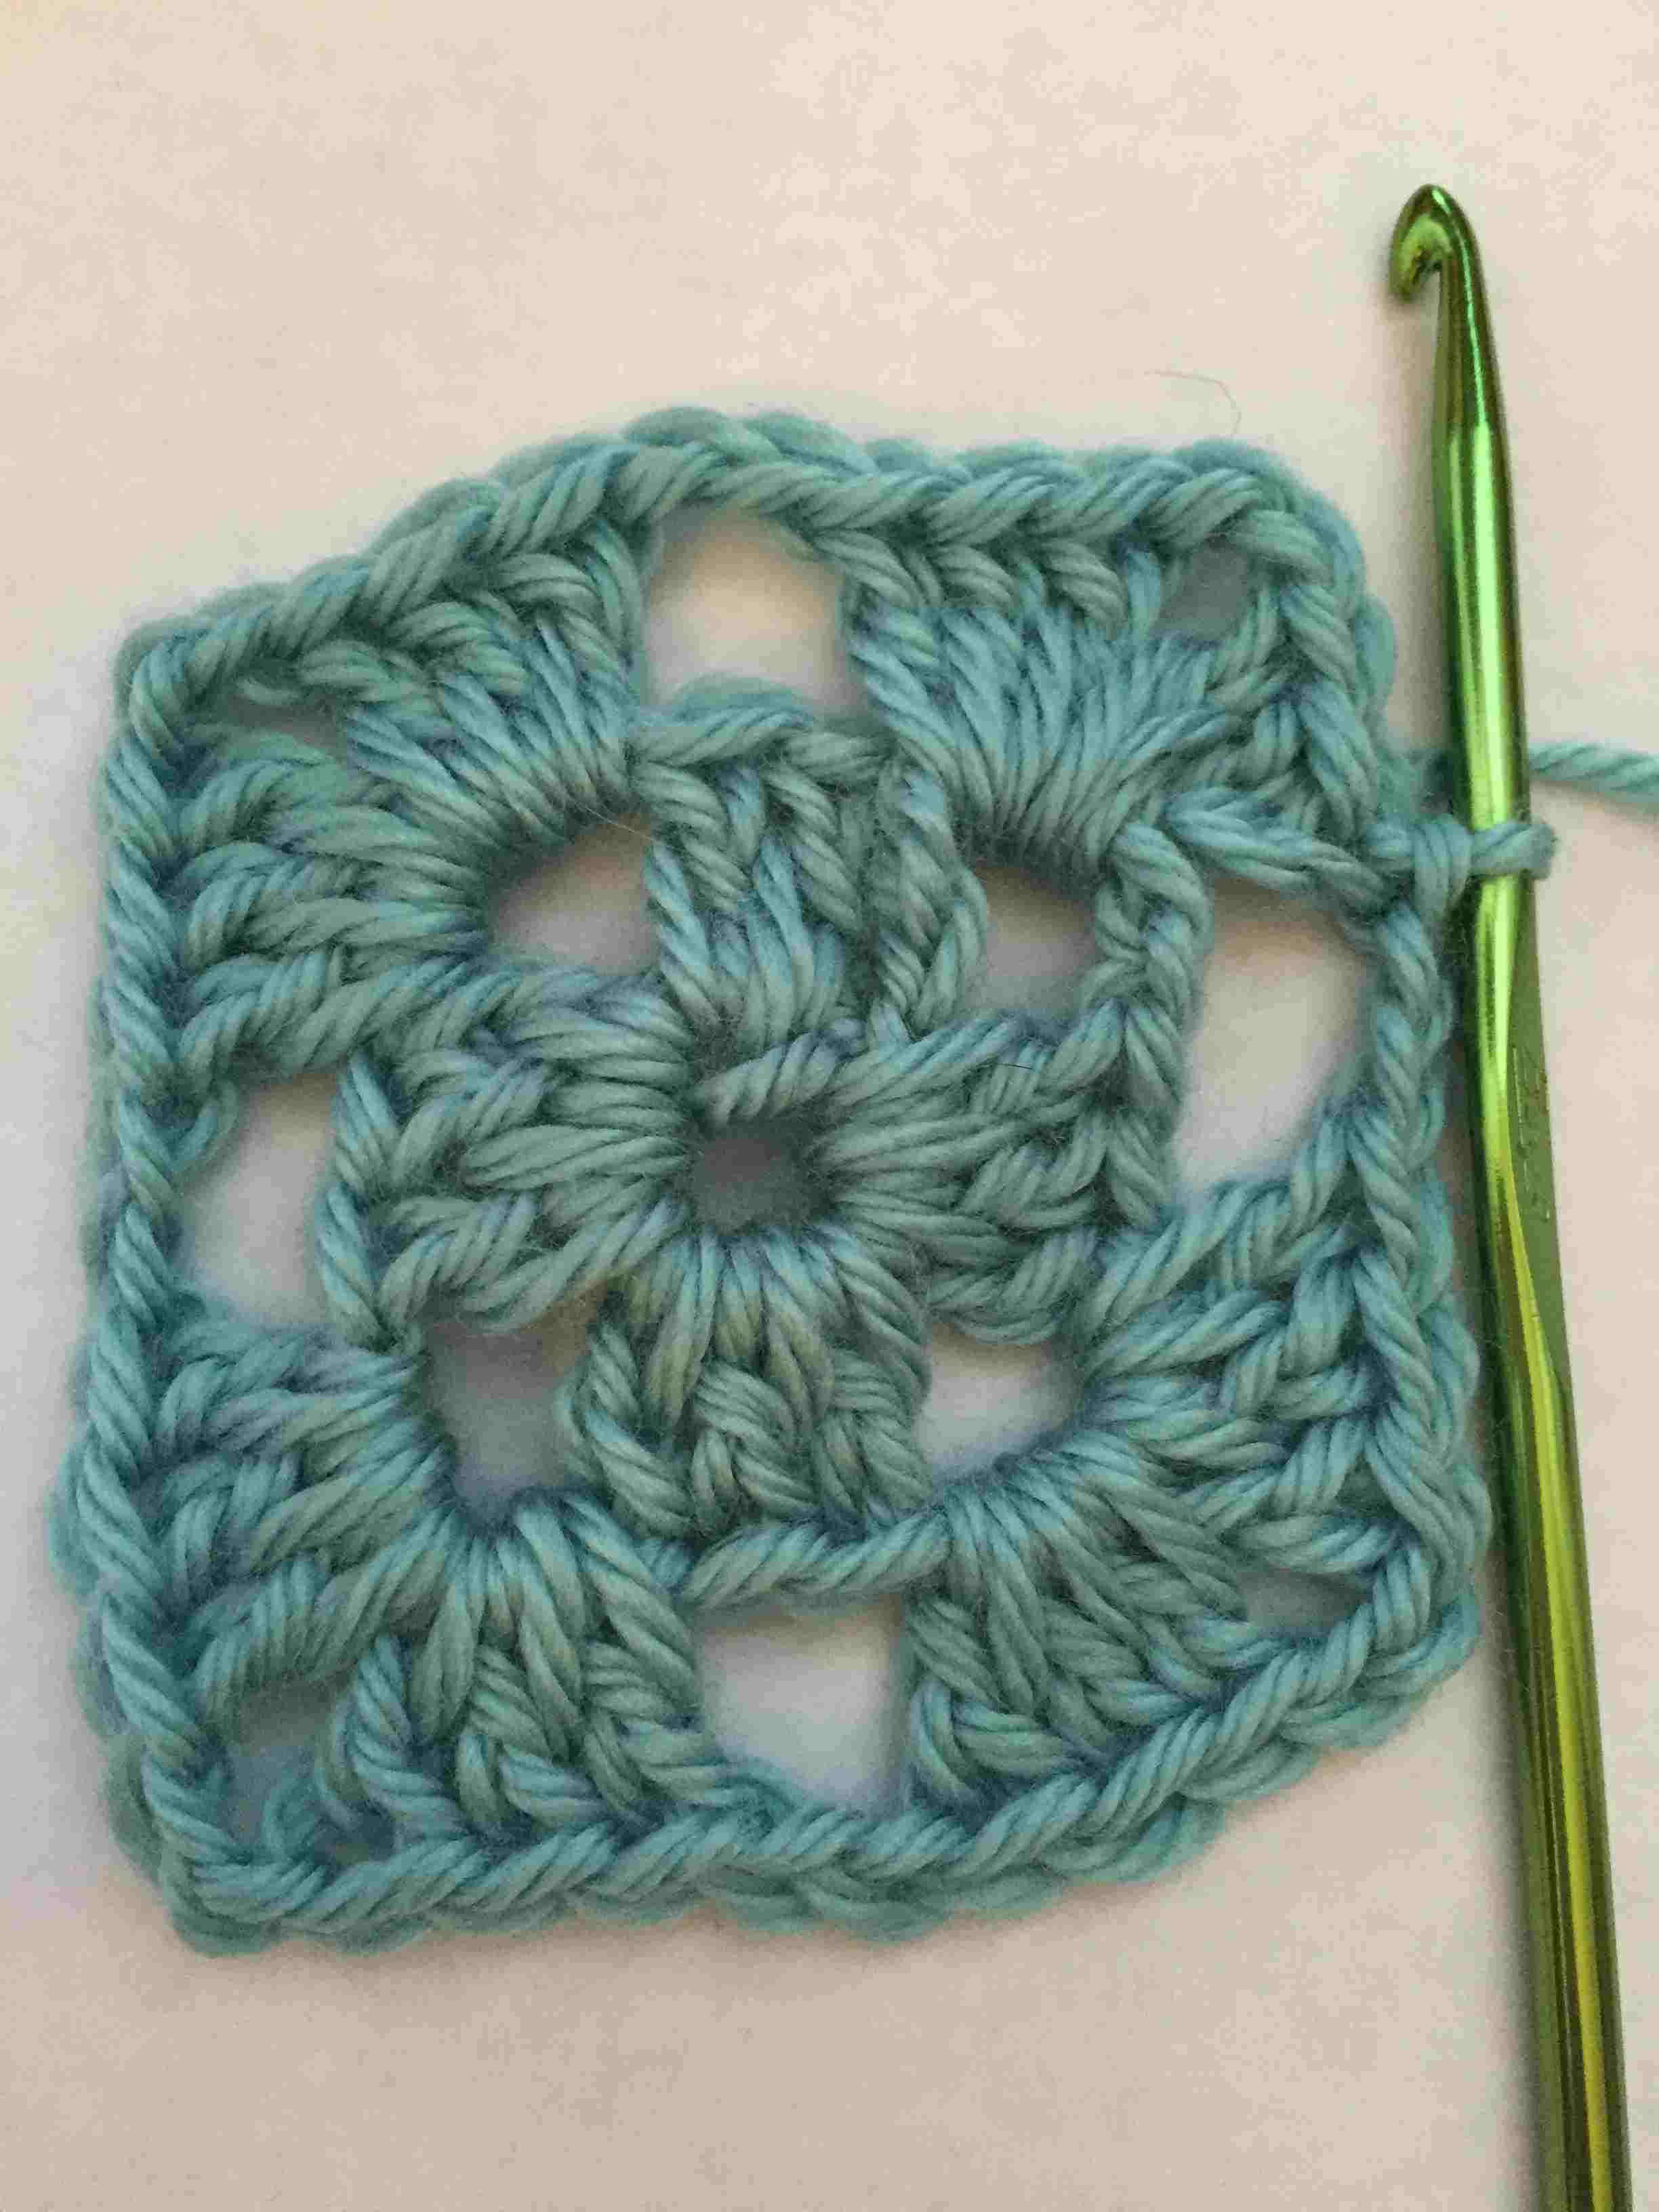 Easy granny square crochet pattern izmirmasajfo